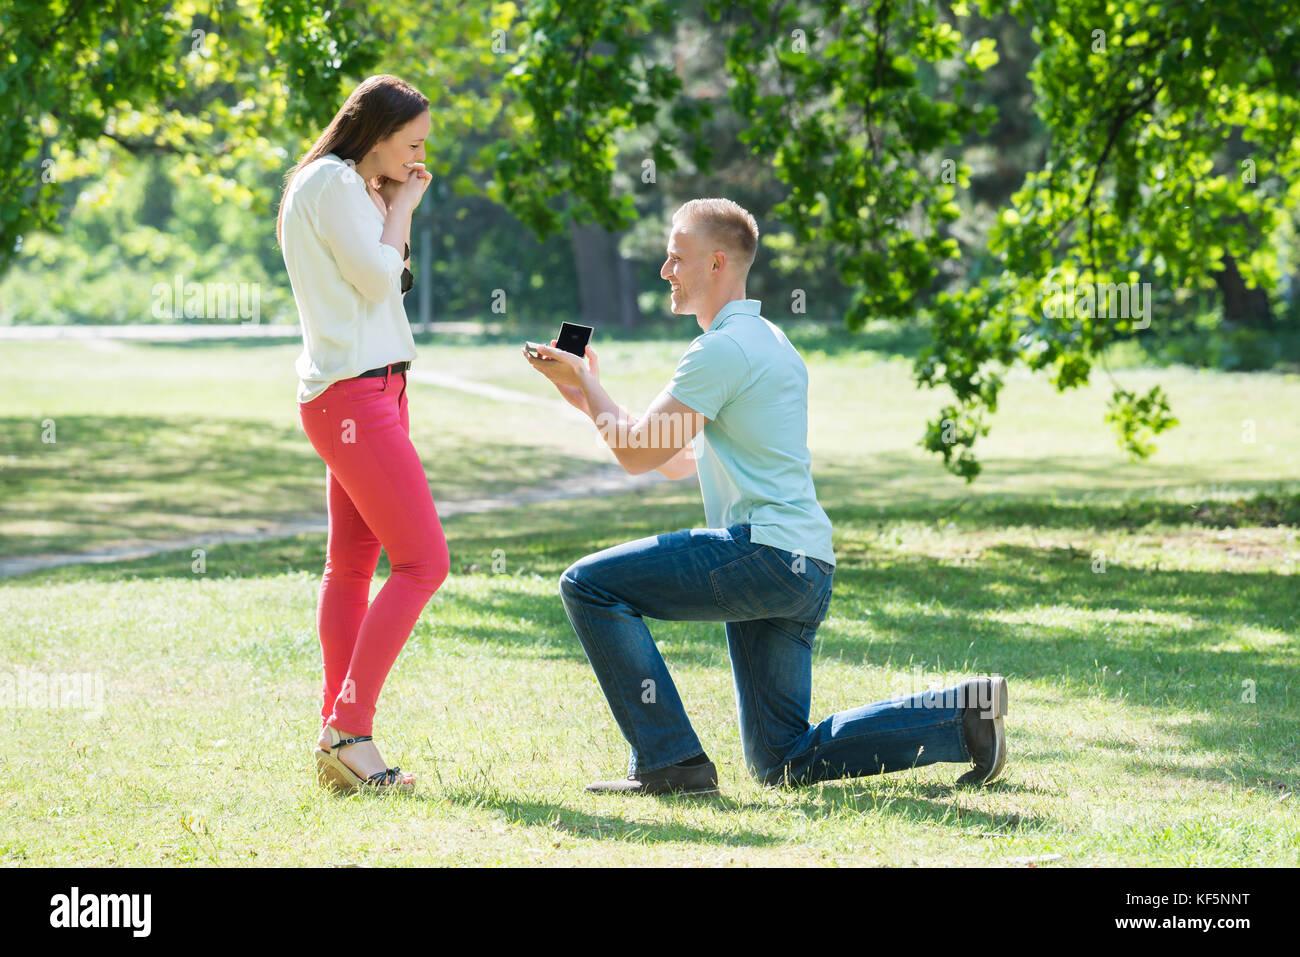 Man Kneeling And Making Proposal To Woman At Park - Stock Image